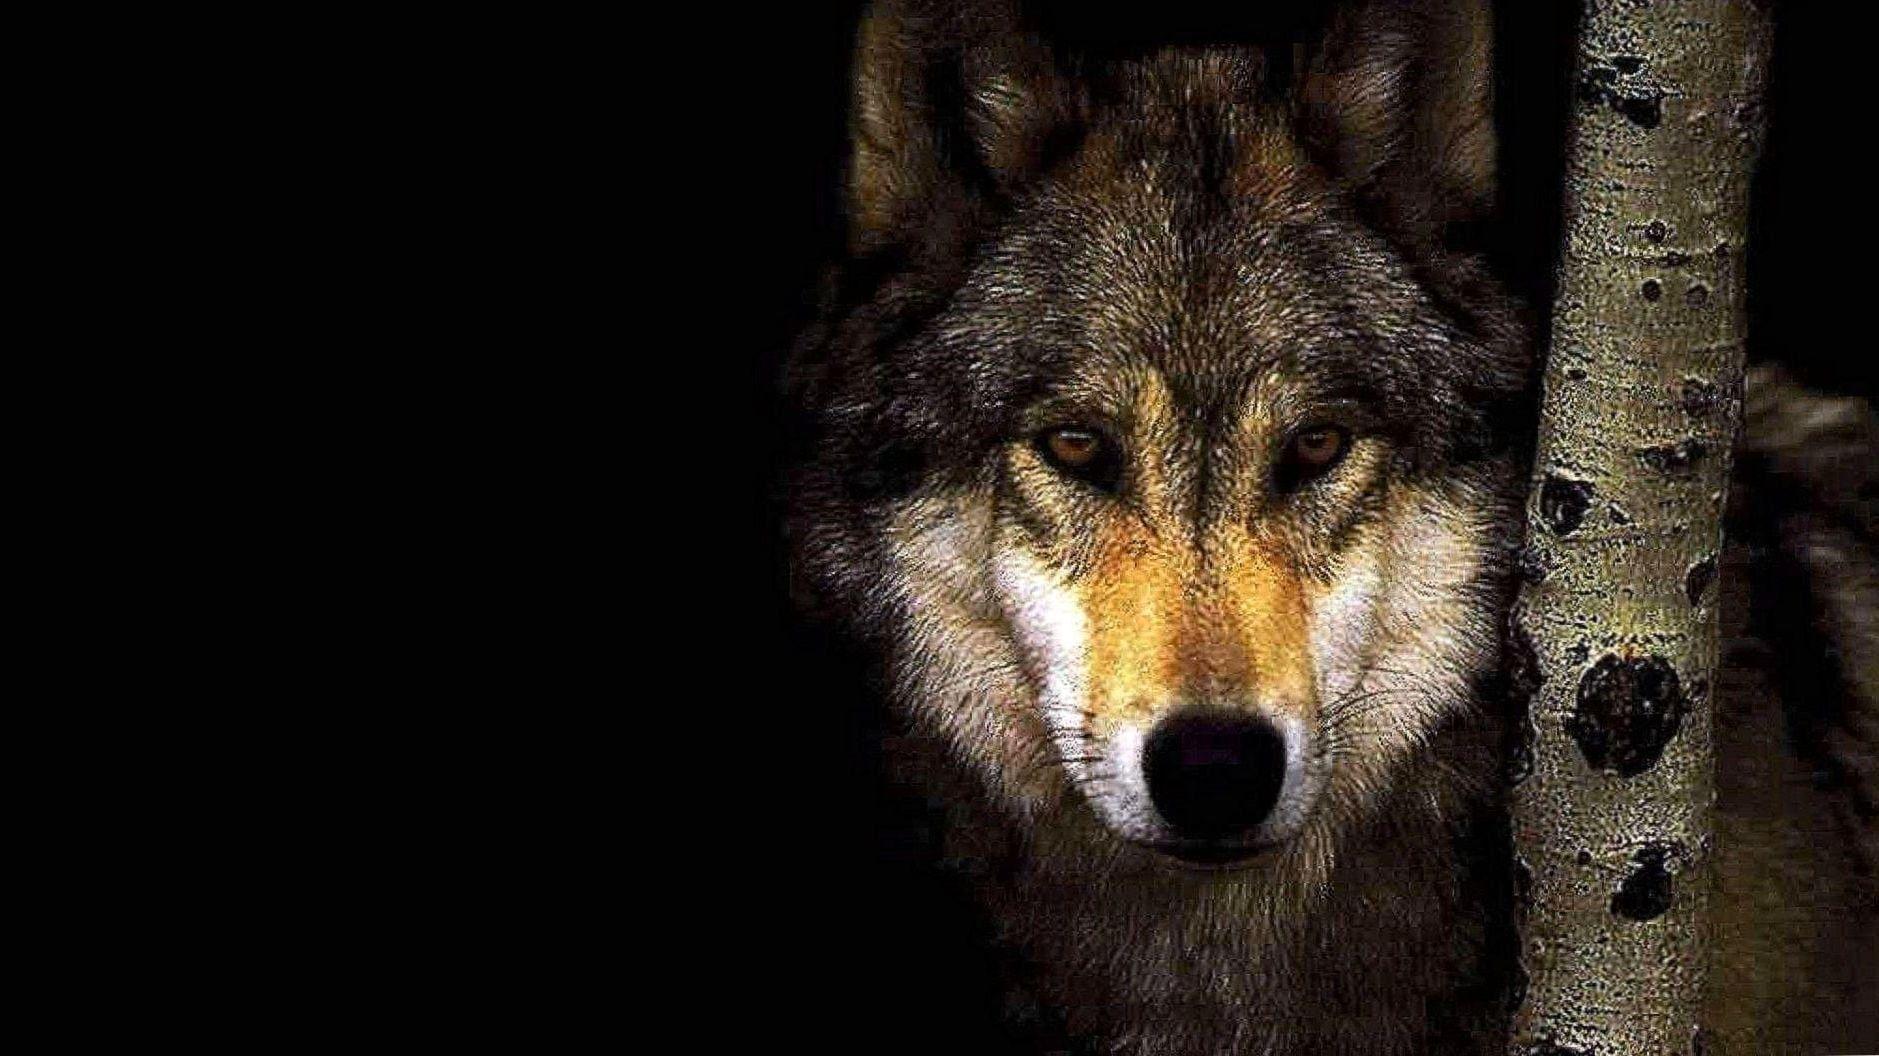 1920x1080 Wallpapers Hd Wolf 1920x1080 Wallpapers Hd Wolf Wolf Wallpaper Angry Wallpapers Dark Wallpaper